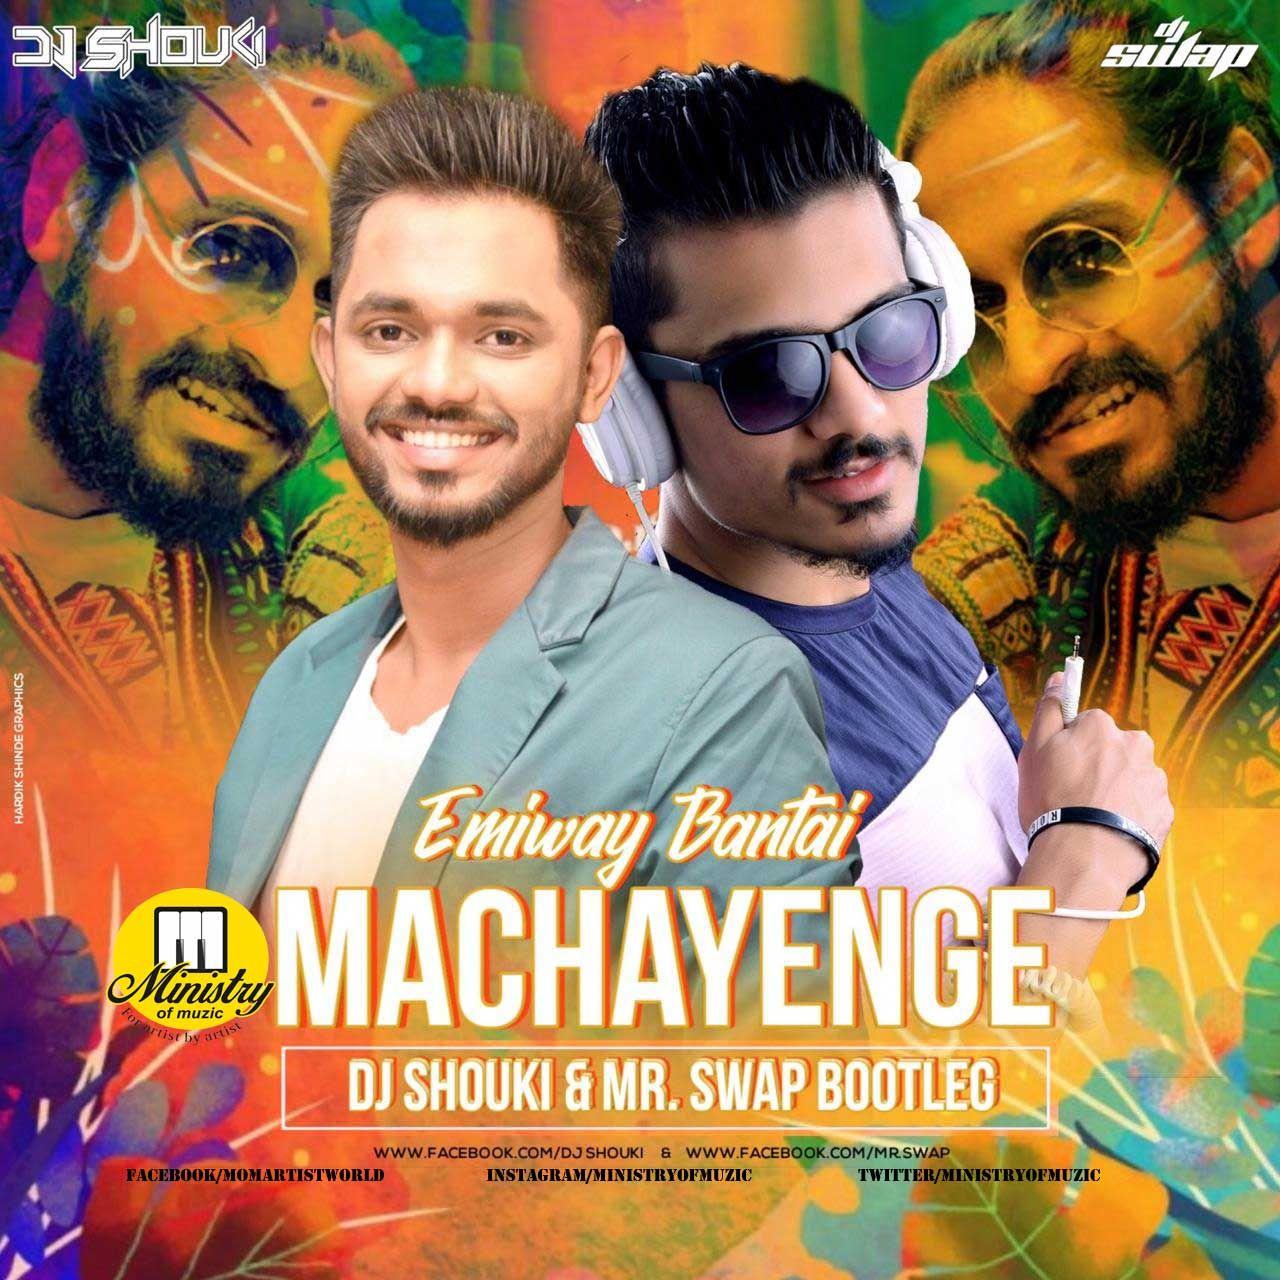 Machayenge Mp3 Download Emiway Bantai Mp3 Song Latest Mp3 Songs